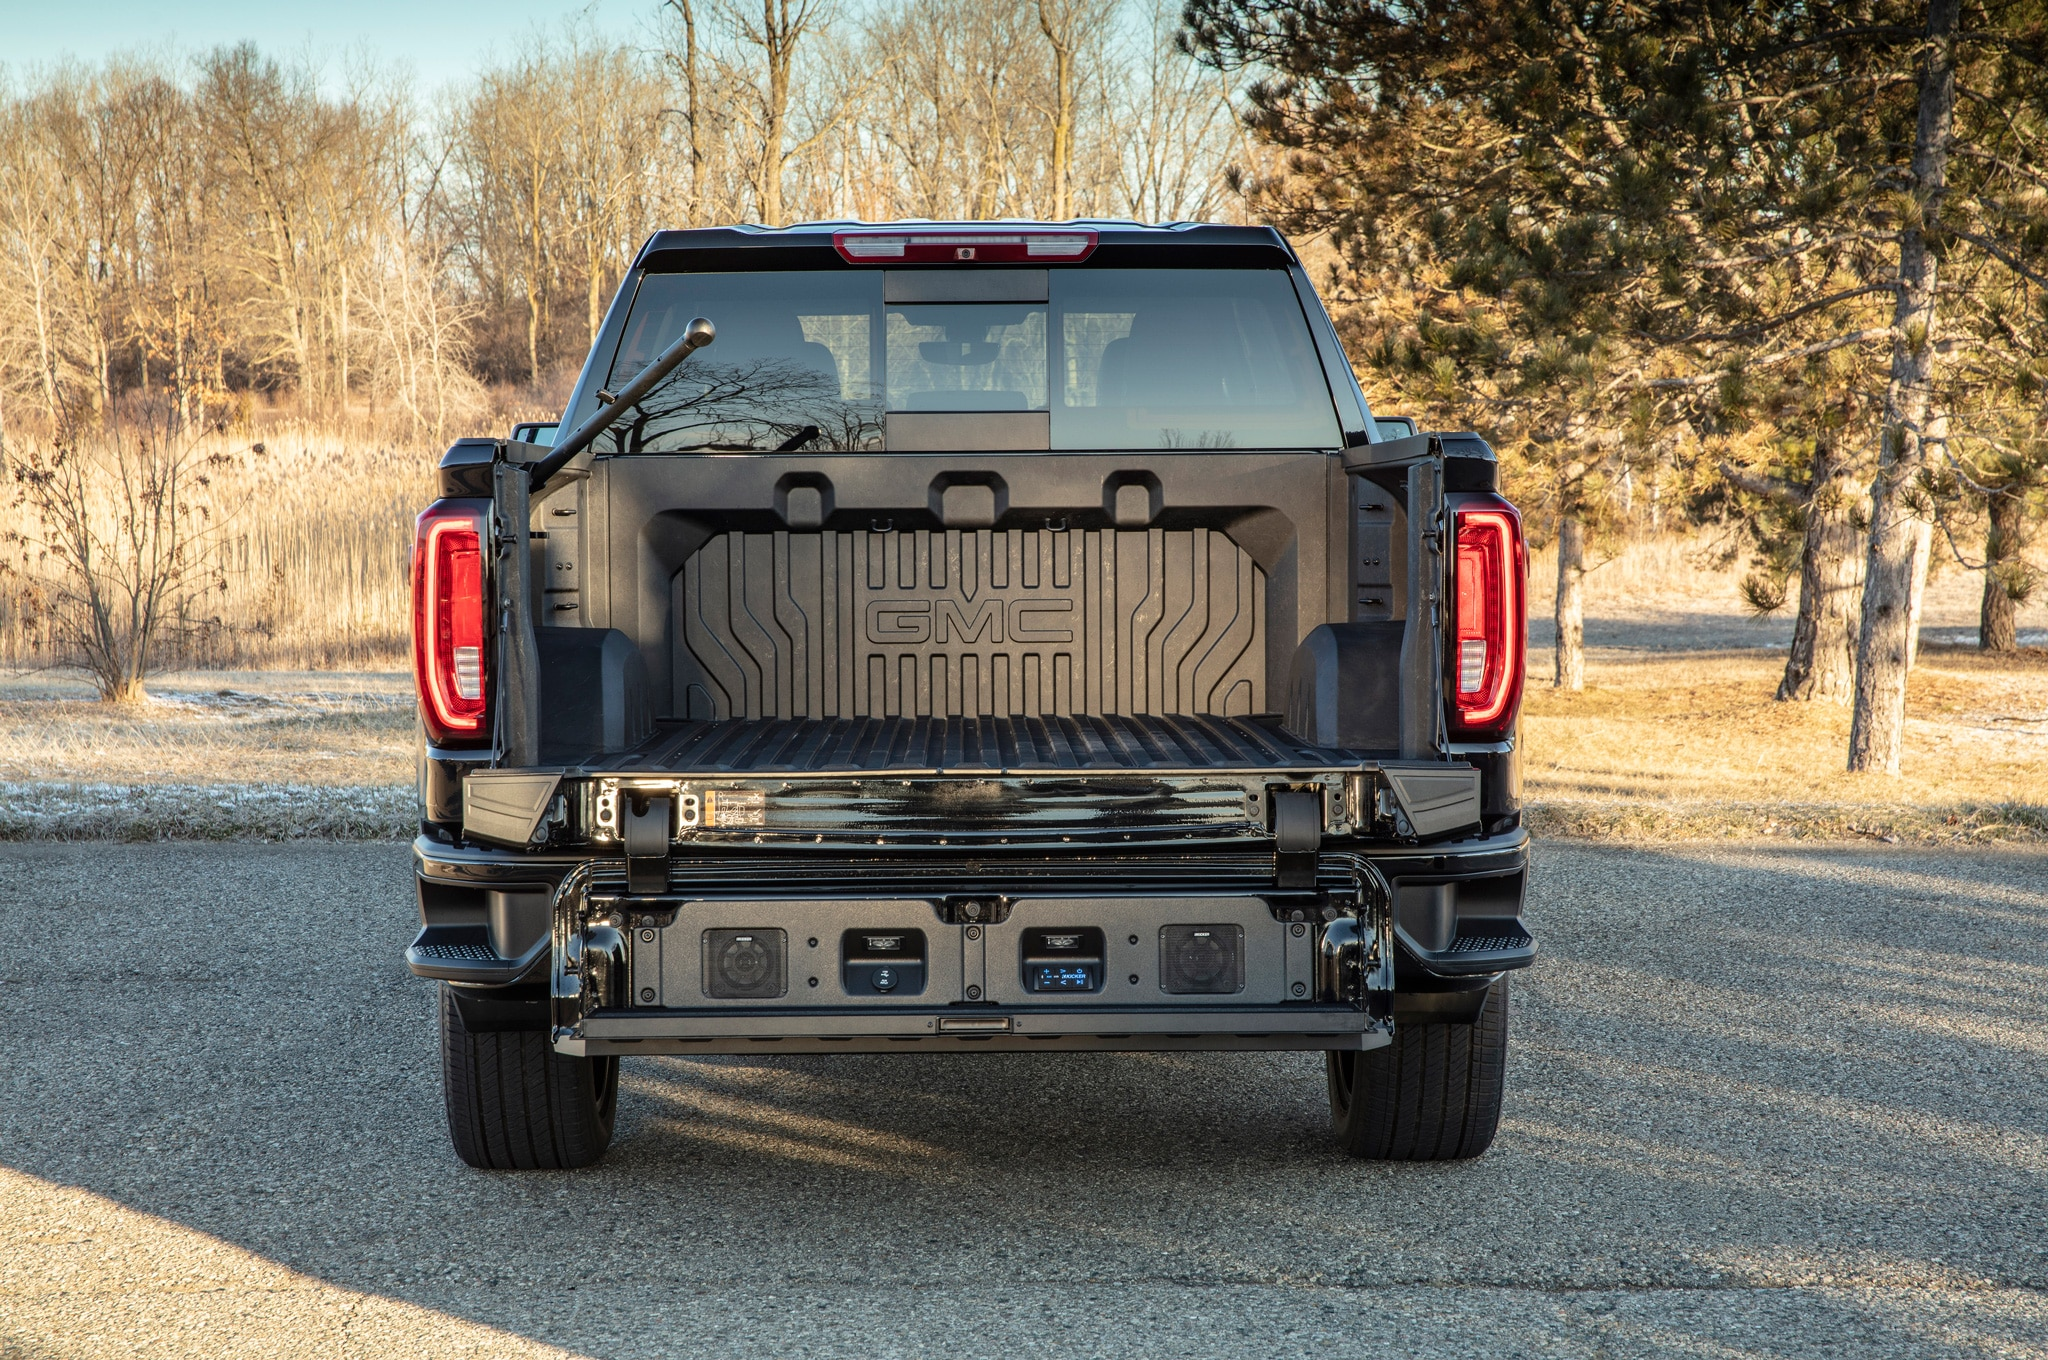 2019 gmc sierra 1500 carbonpro bed